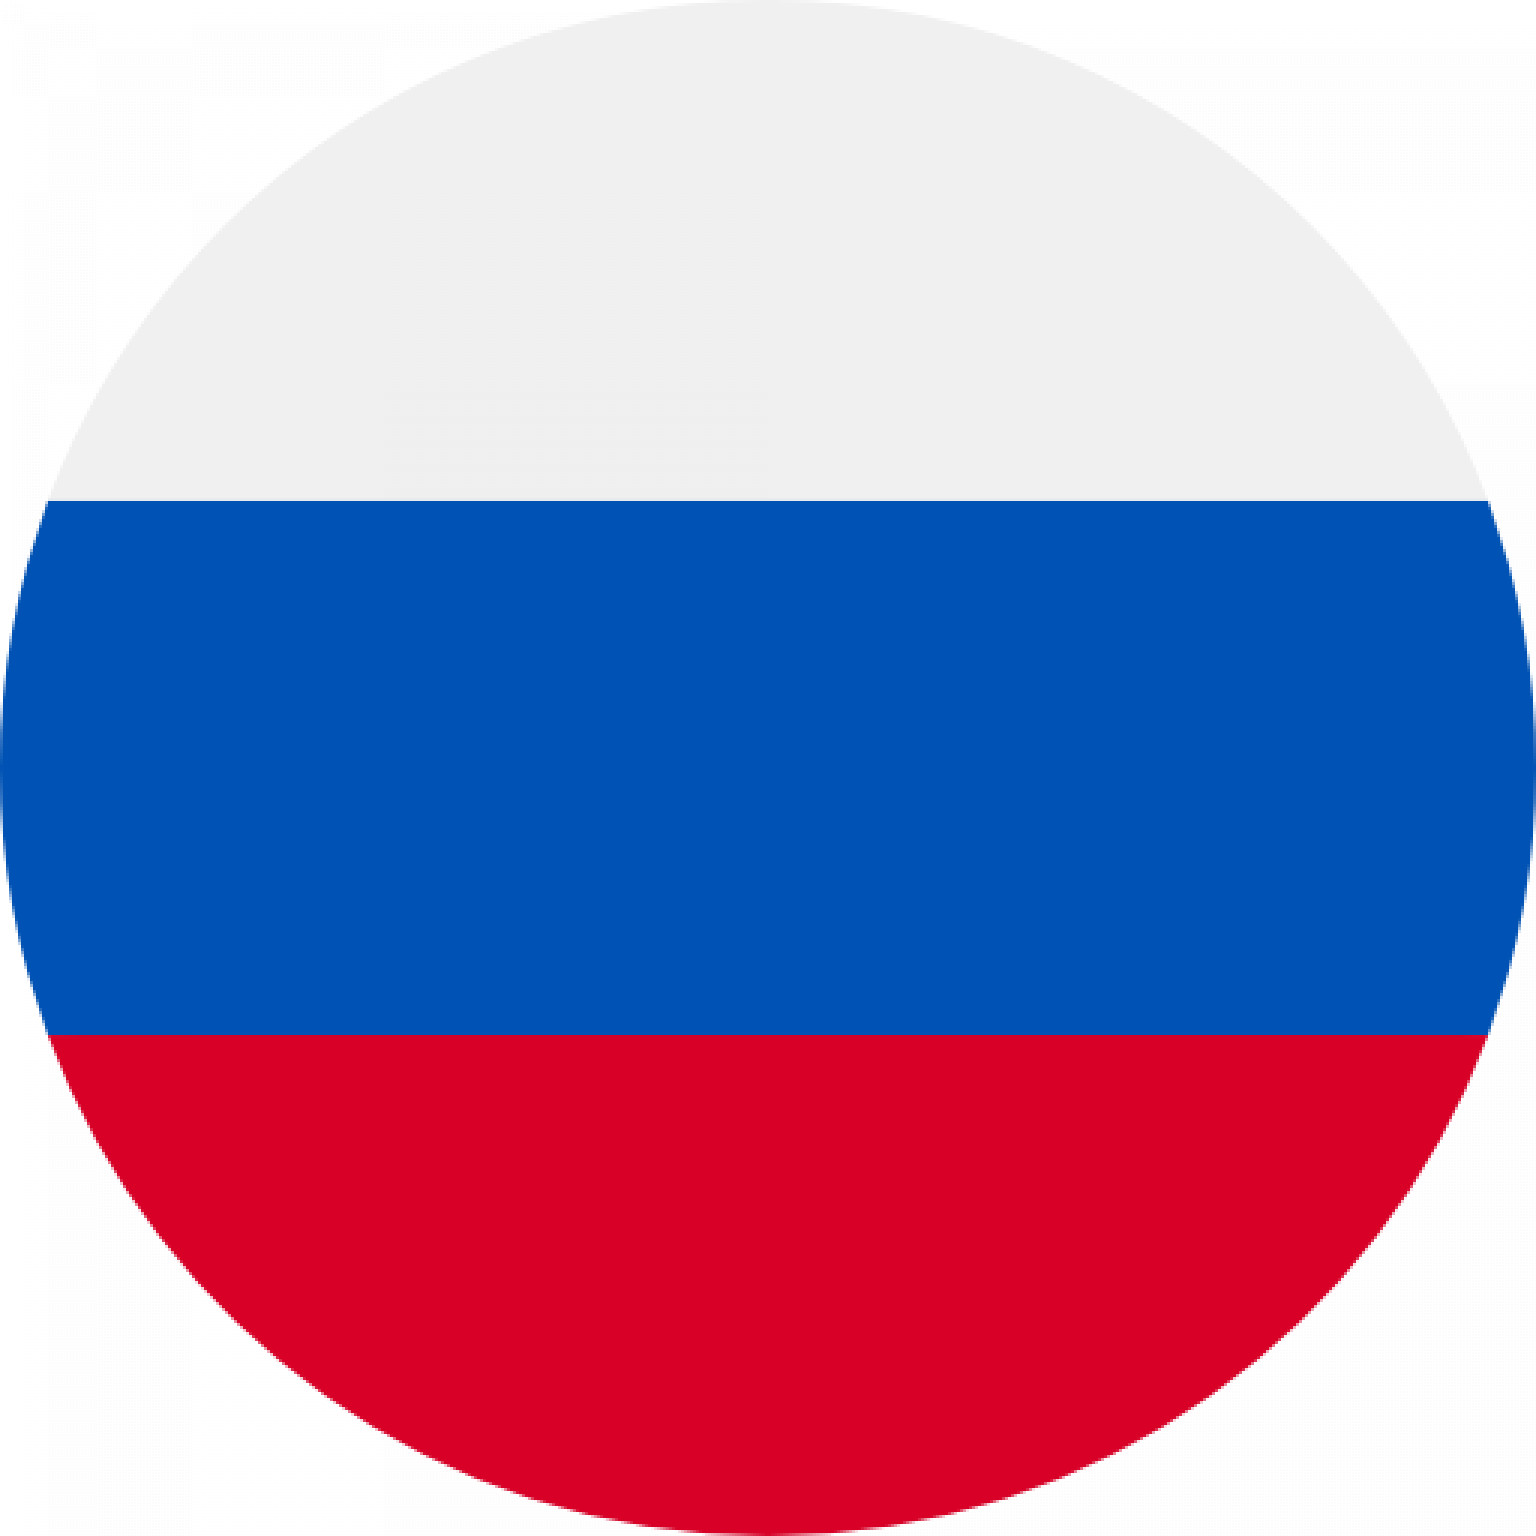 Russian Peer-to-Peer lending platforms and market